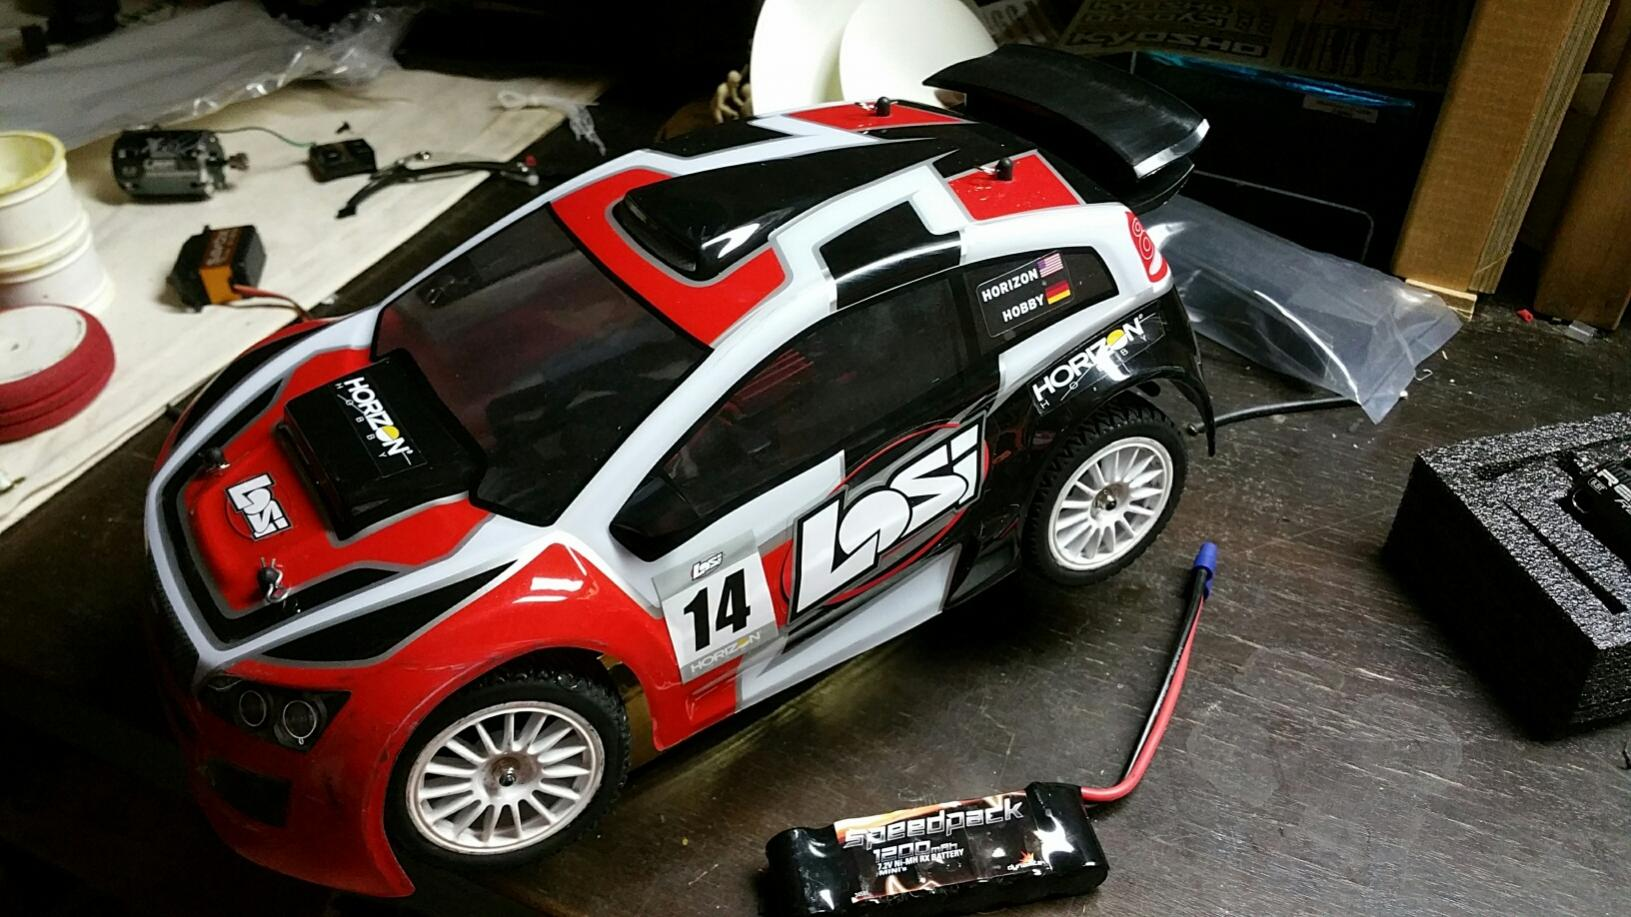 Losi mini rally 1/14 Super Clean & Cheap - R/C Tech Forums